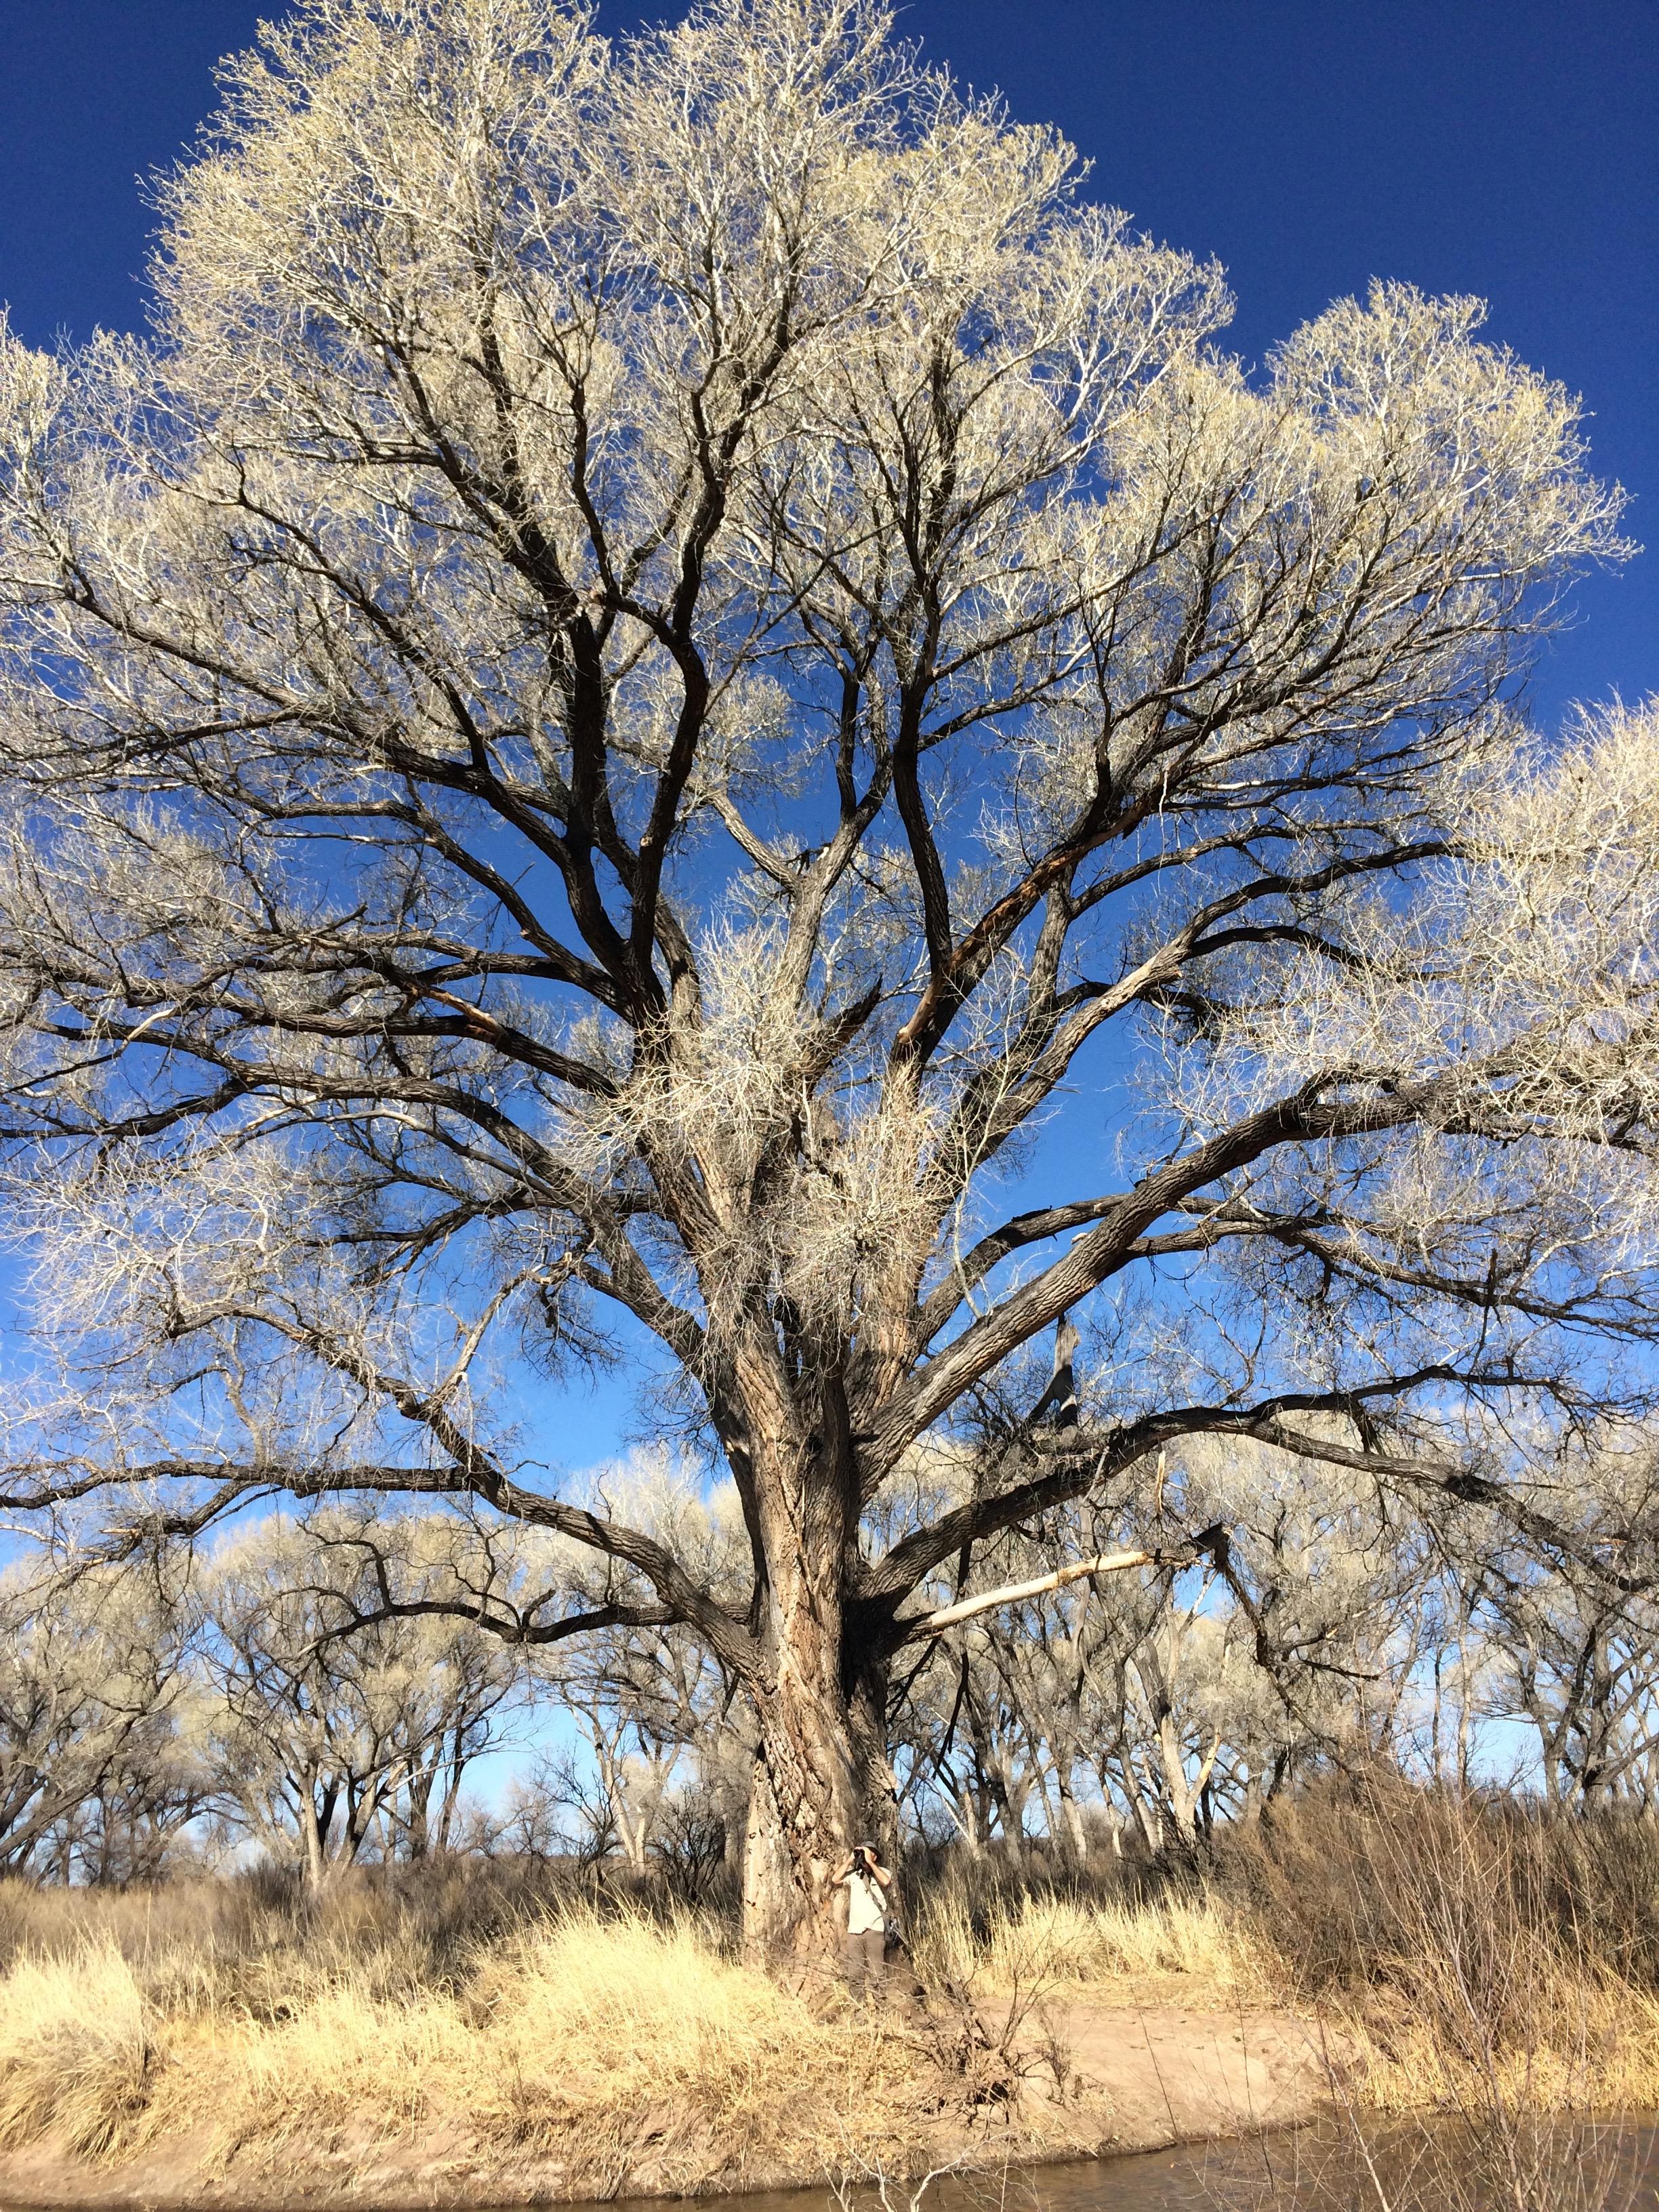 The biggest cottonwood trees I have ever seen at San Pedro River National Riparian Area, Arizona